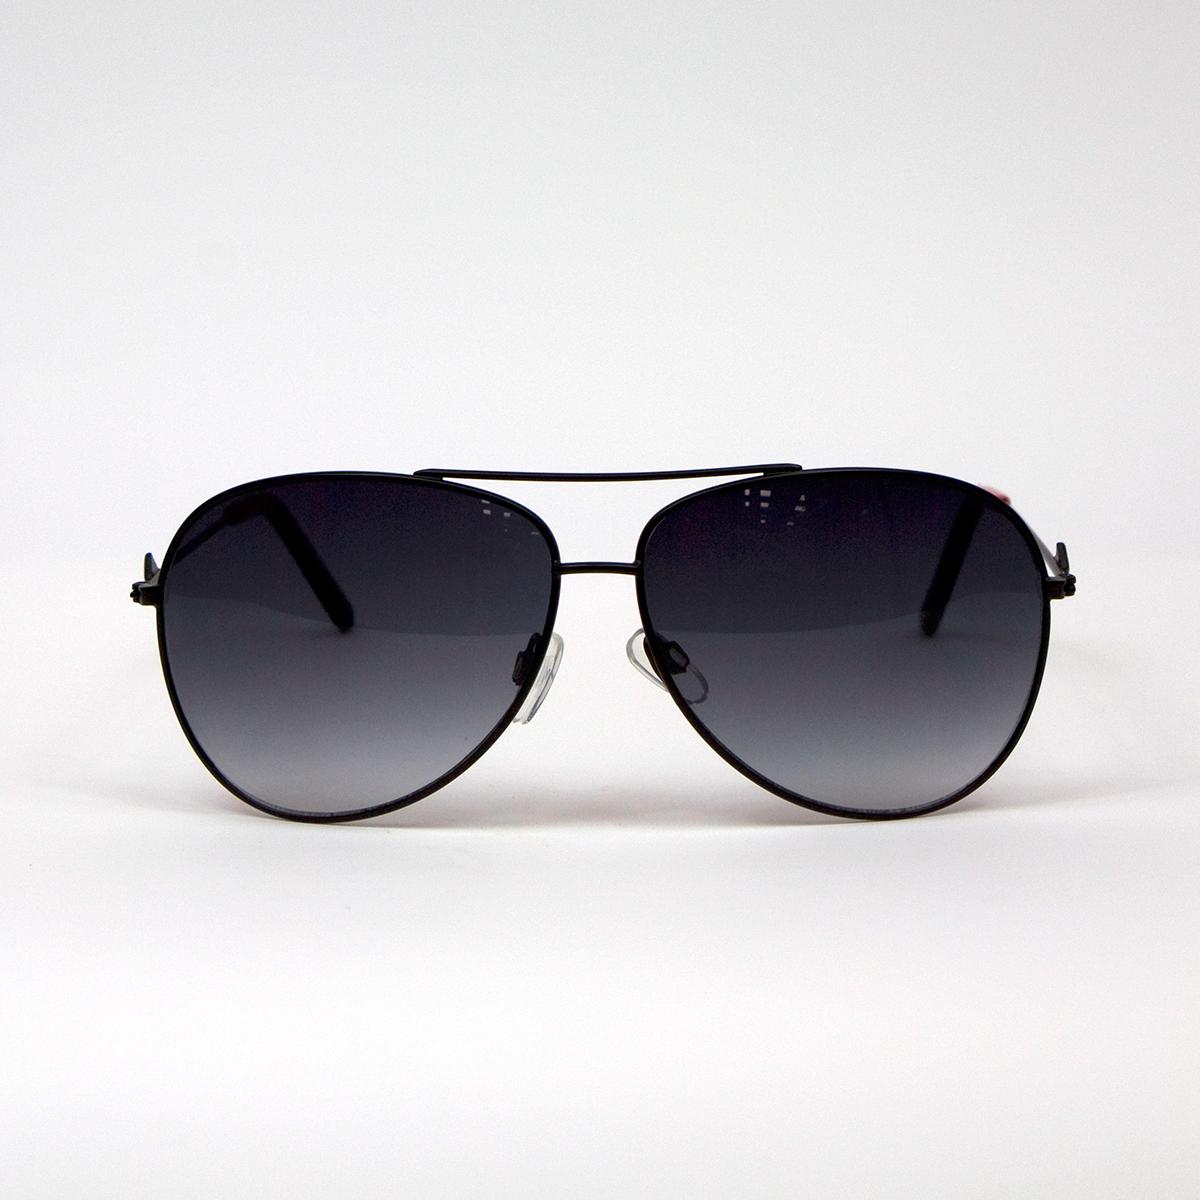 Sunglasses clipart mens sunglasses. Clip art men very